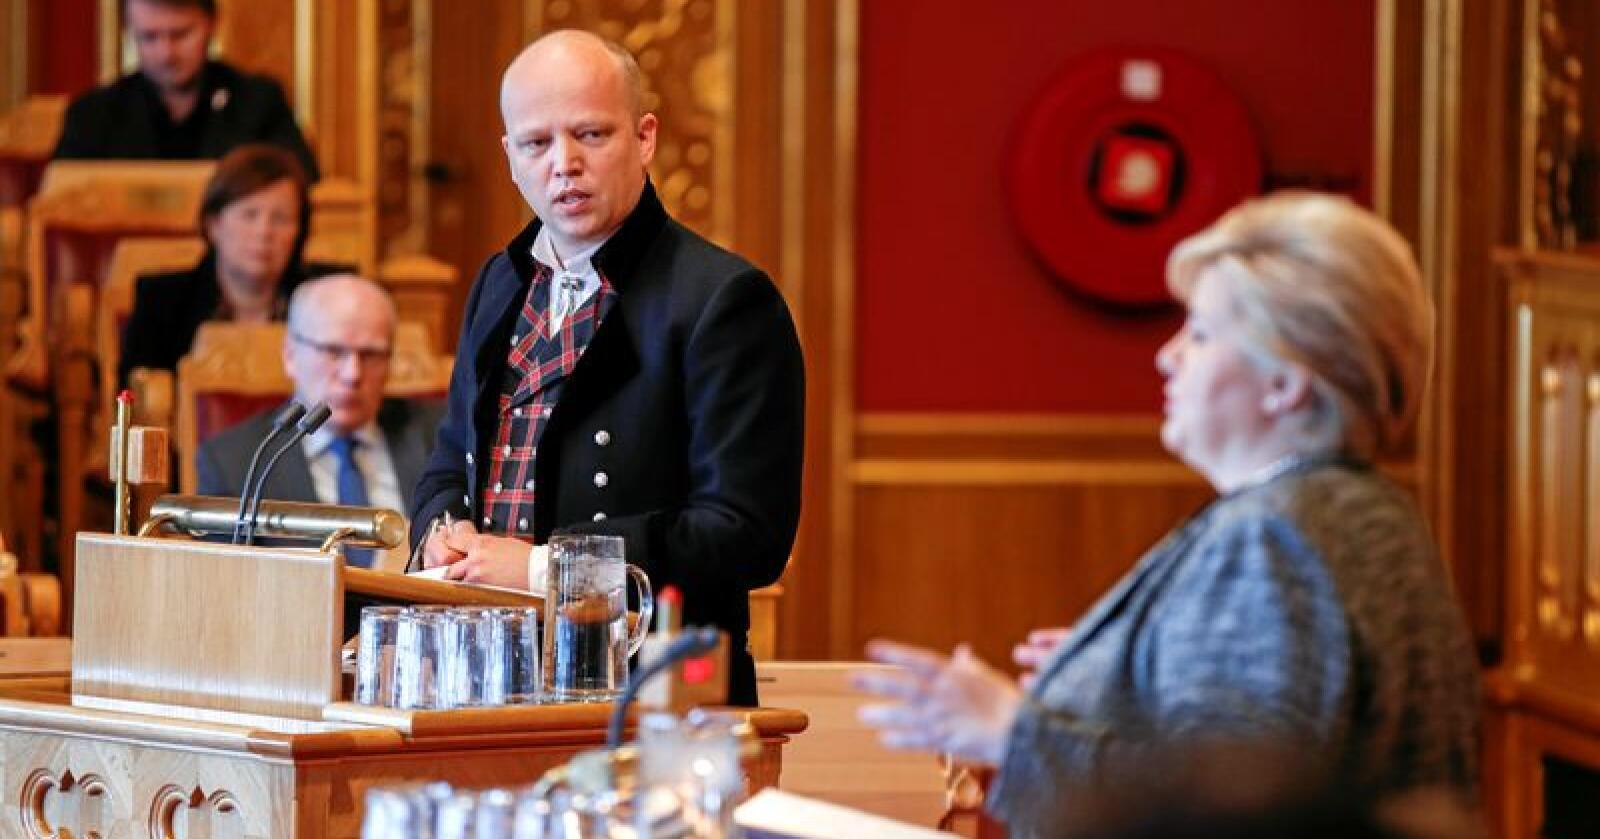 Sp-leder Trygve Slagsvold Vedum, for anledningen ikledd valdresbunad, grillet statsminister Erna Solberg under Stortingets muntlige spørretime. Foto: Vidar Ruud / NTB scanpix